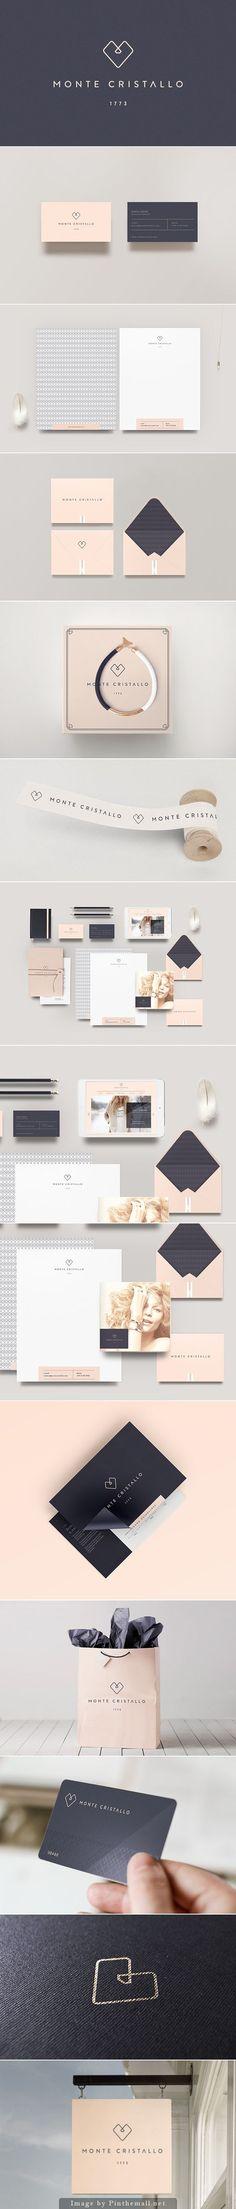 13. Uma identidade visual despojada, moderna e minimalista para uma loja de joias! #IdentidadeVisual #Logo #Propaganda #Branding #Creative #TudoMarketing #TudoMkt